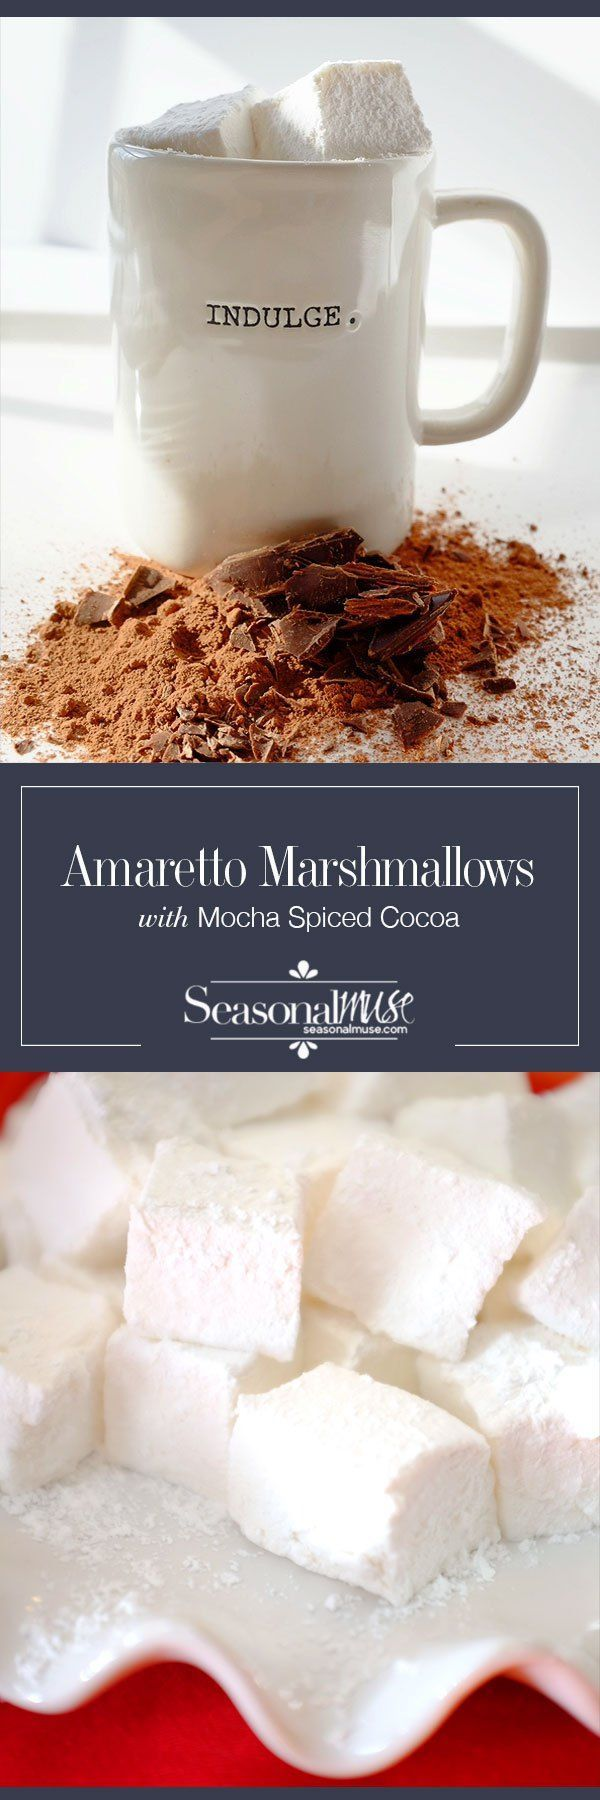 17 Ideas About Marshmallows On Pinterest Homemade